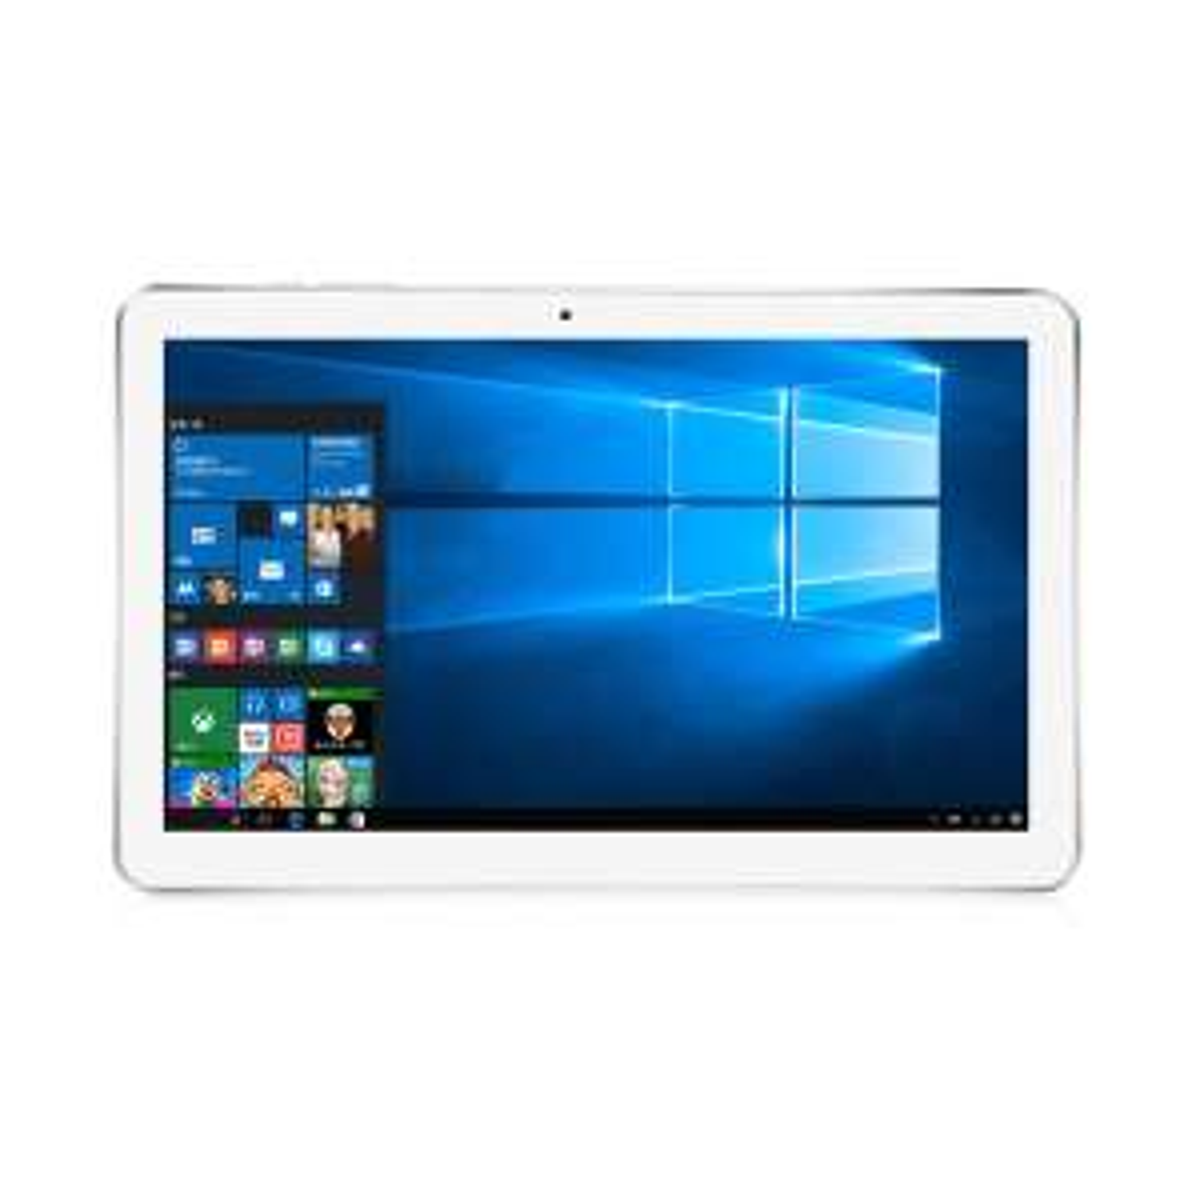 "Tablette 10,6"" Alldocube Mix Plus Dual Boot Android/Windows - 128Go de eMMC, 4Go de RAM, Intel 7Y30 (vendeur tiers)"